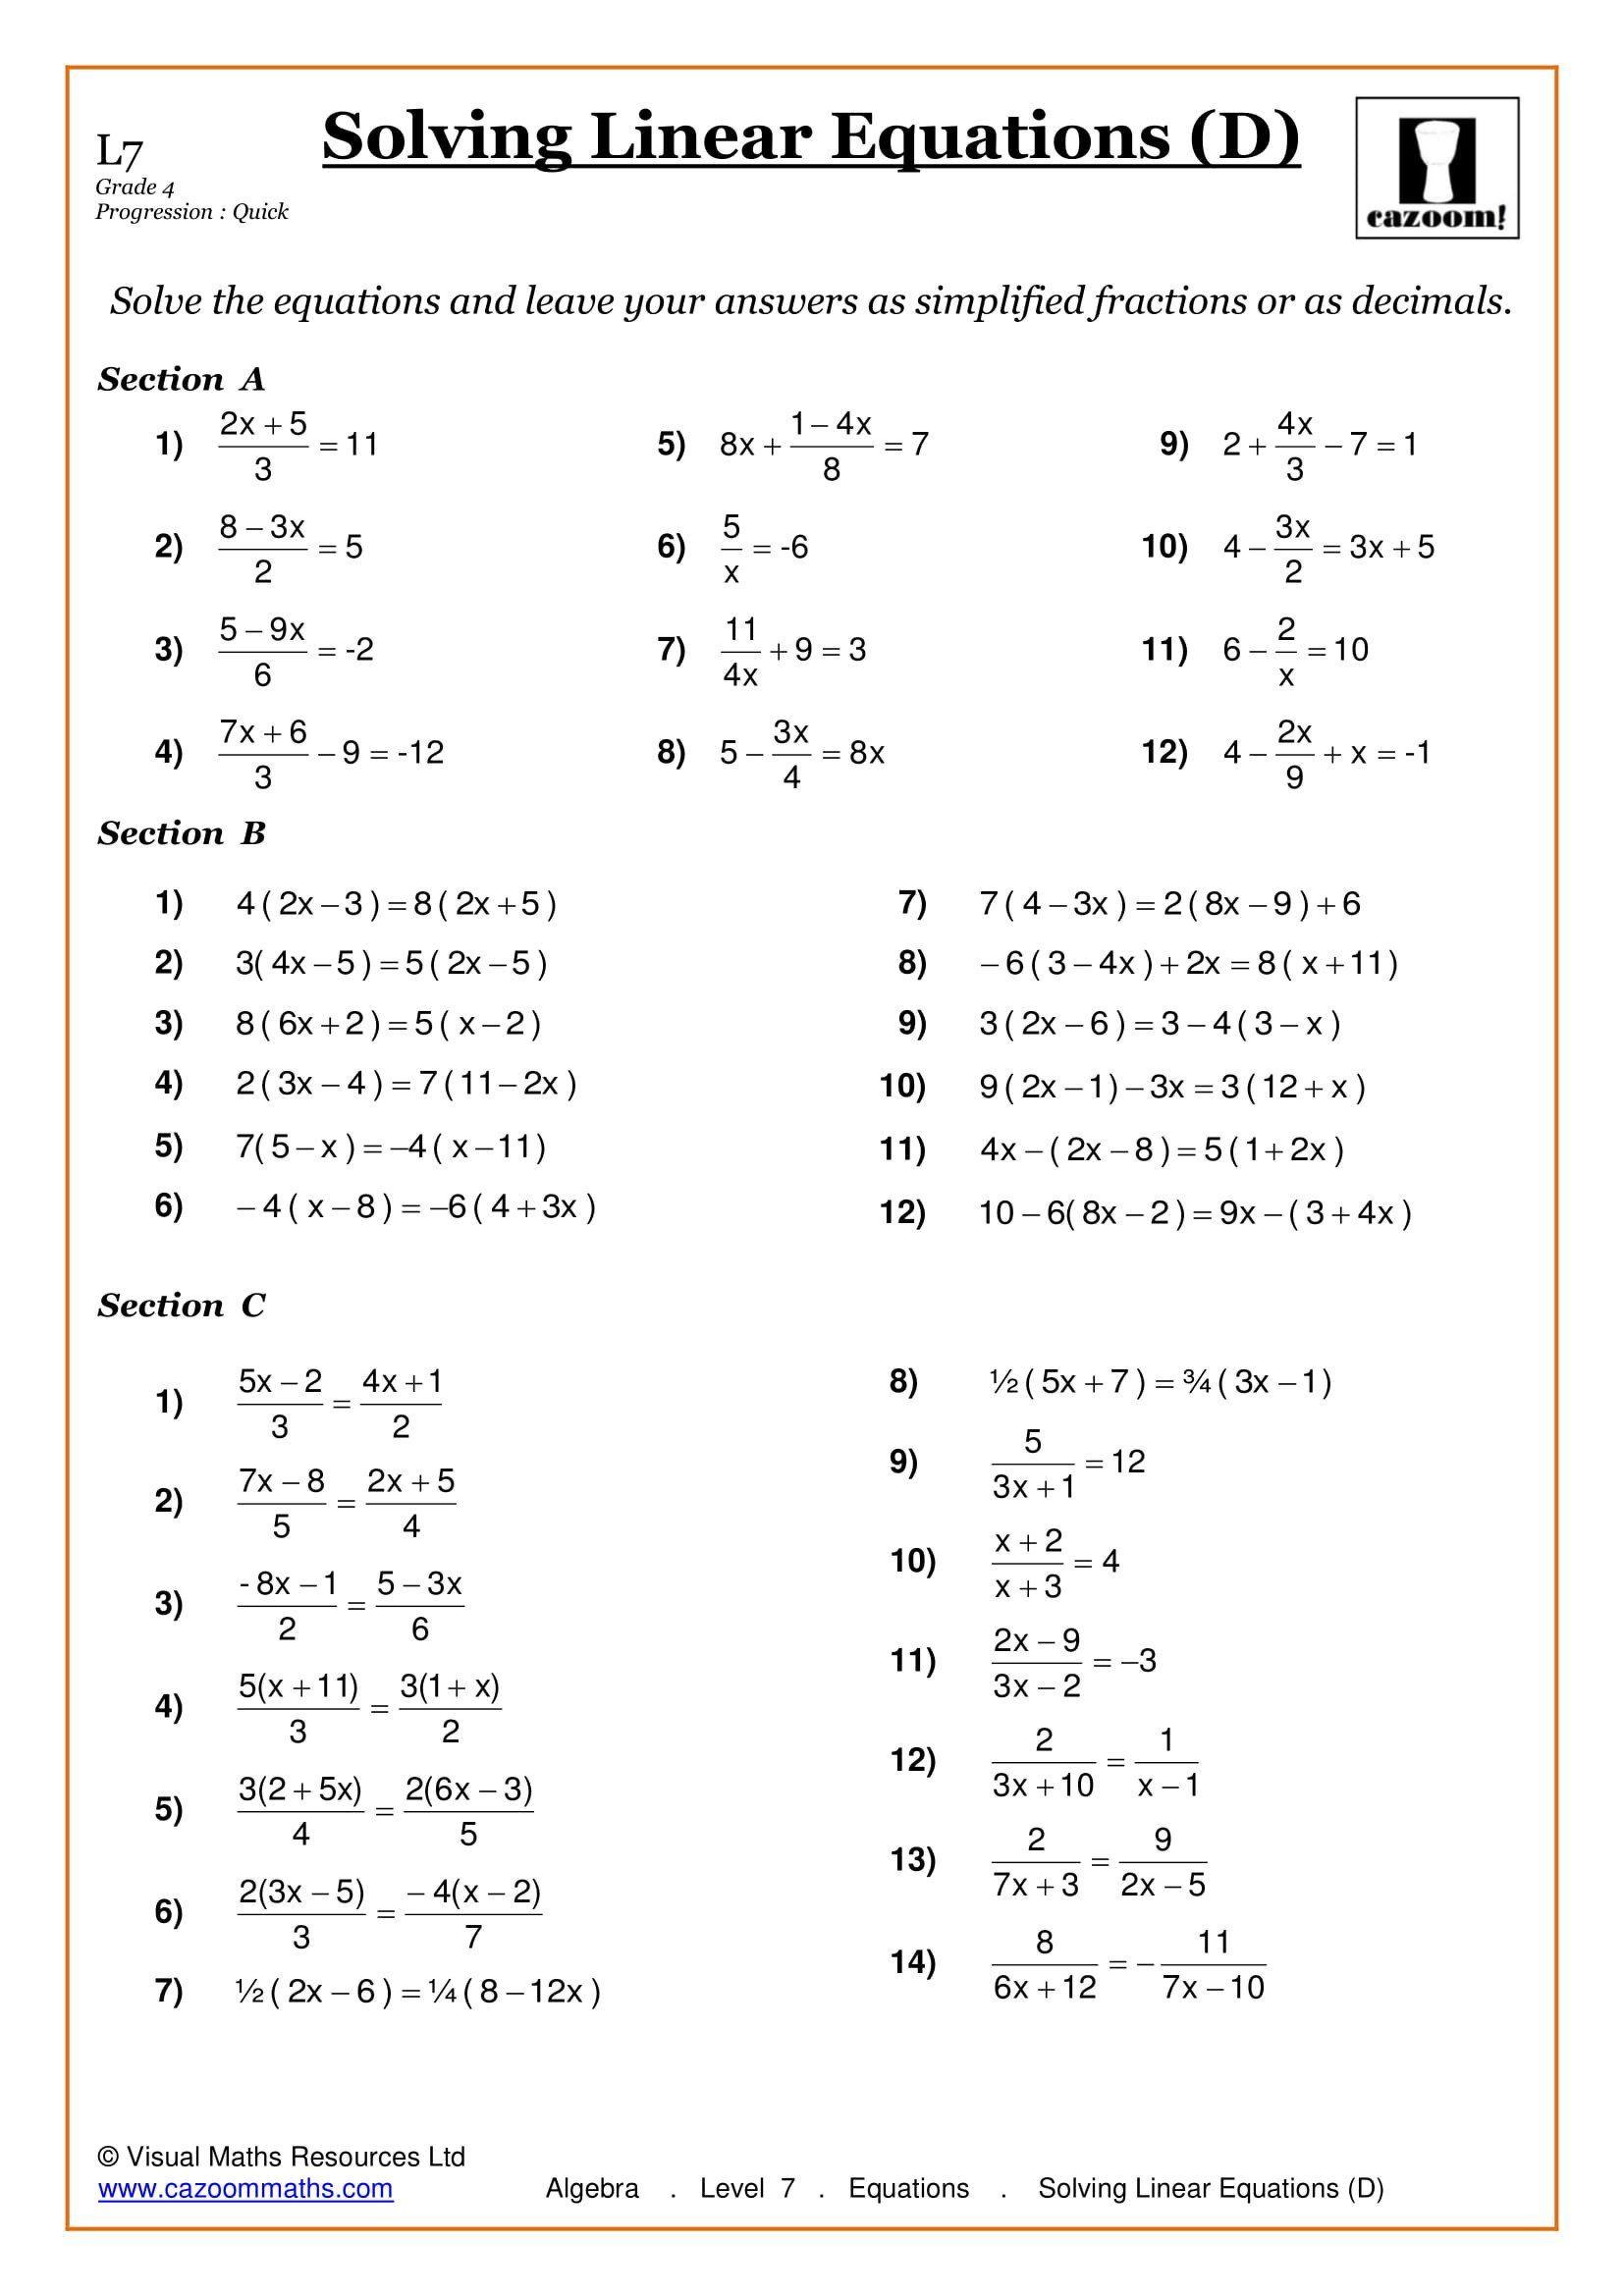 Life Skills Math Worksheets Maths Worksheets In